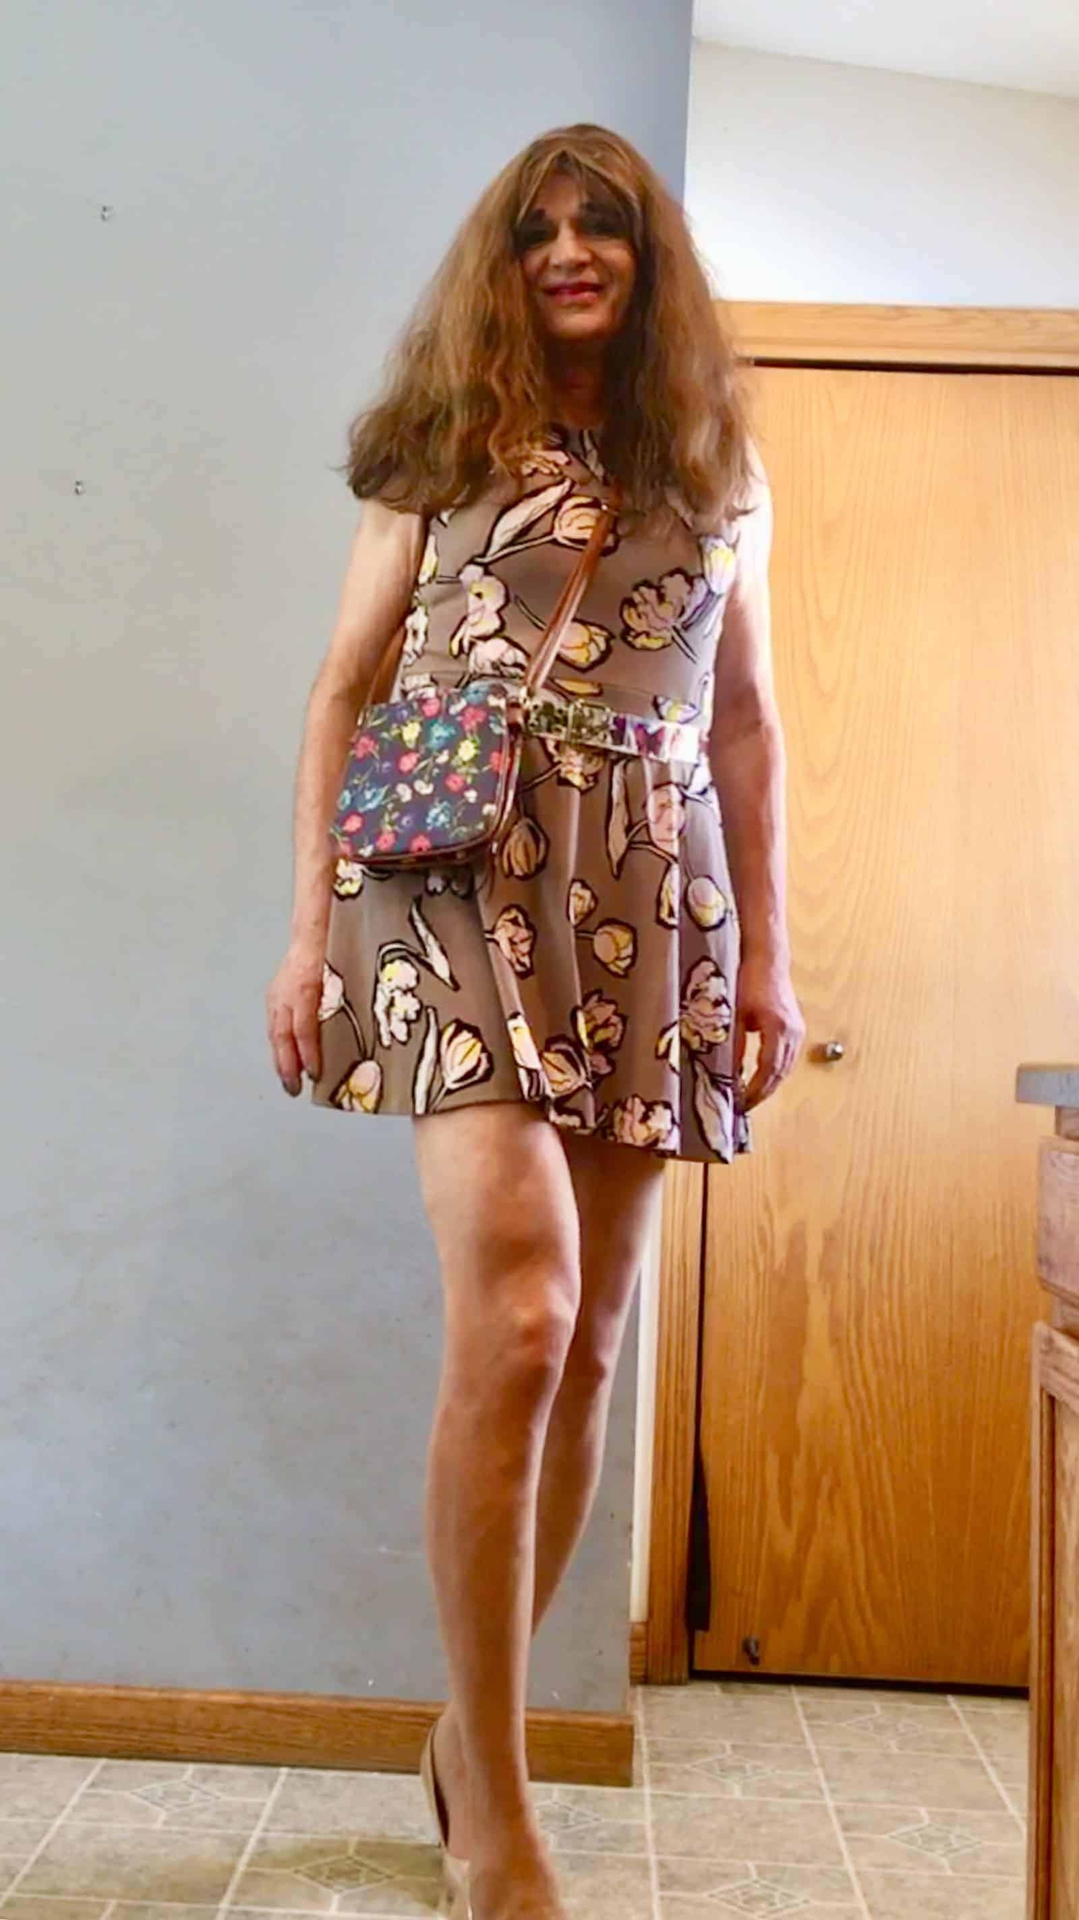 Nude pantyhose and a dress